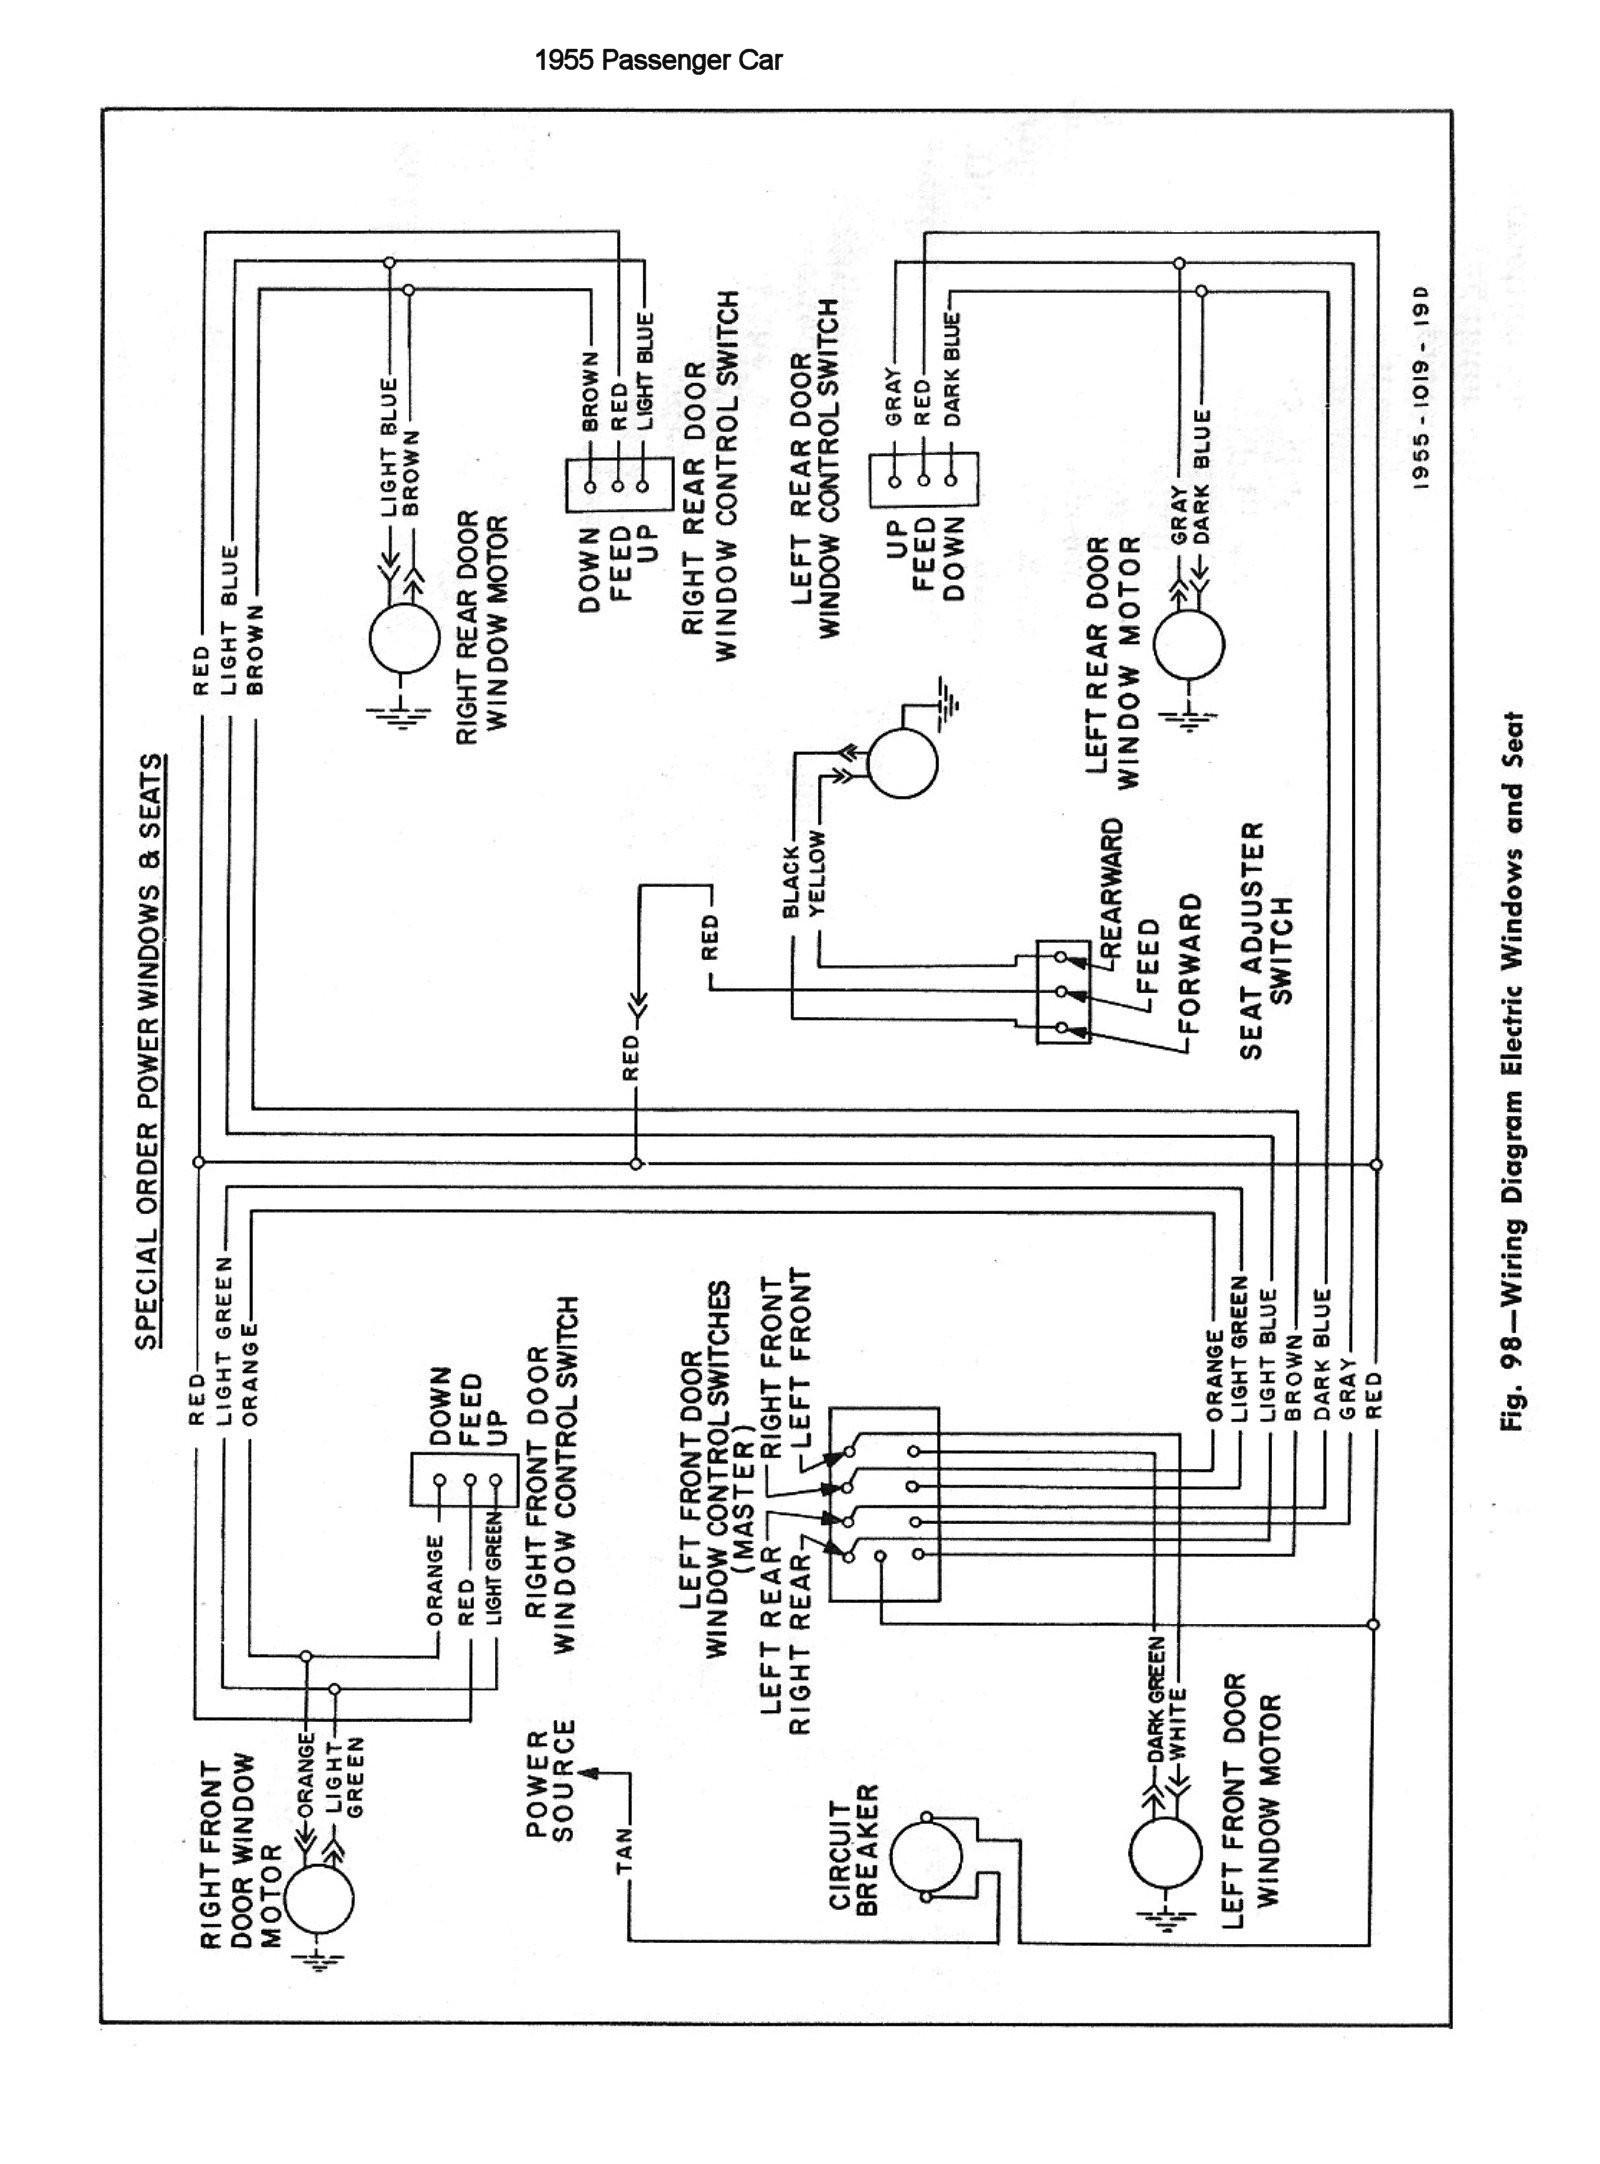 dyson dc24 wiring diagram